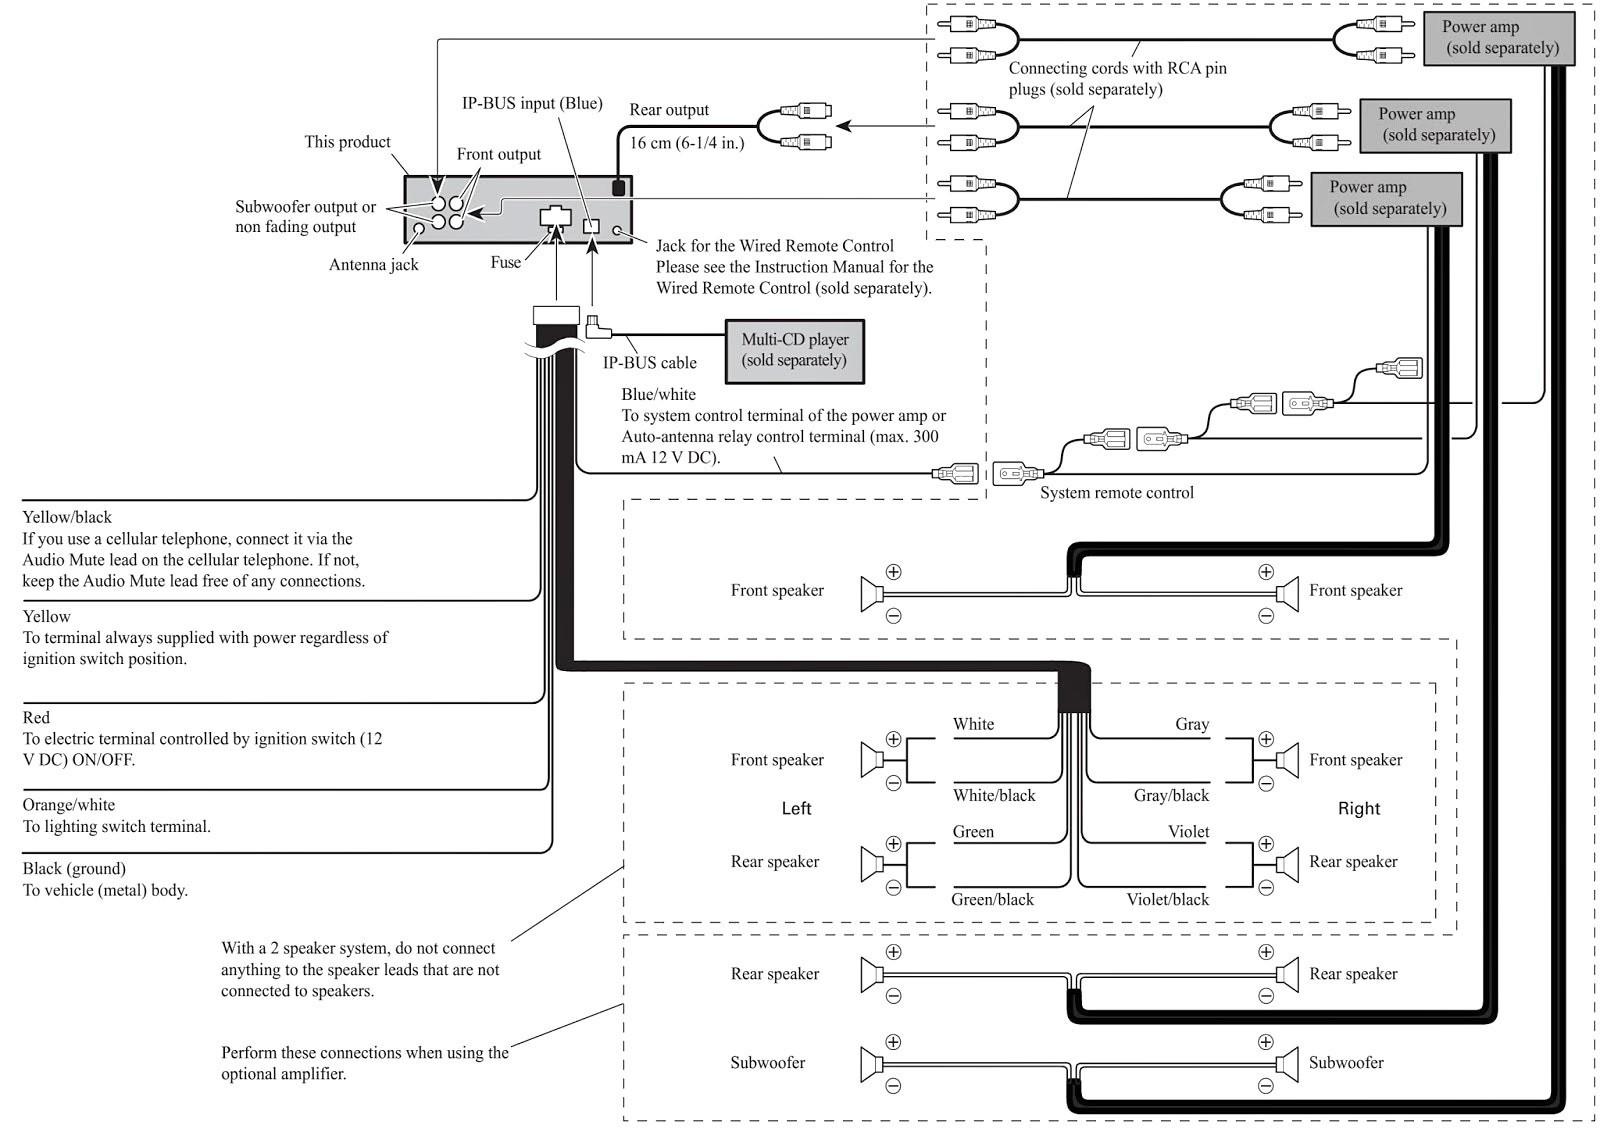 Kd R330 Jvc Car Stereo Wiring Diagram | Wiring Diagram - Jvc Kdr330 Wiring Diagram